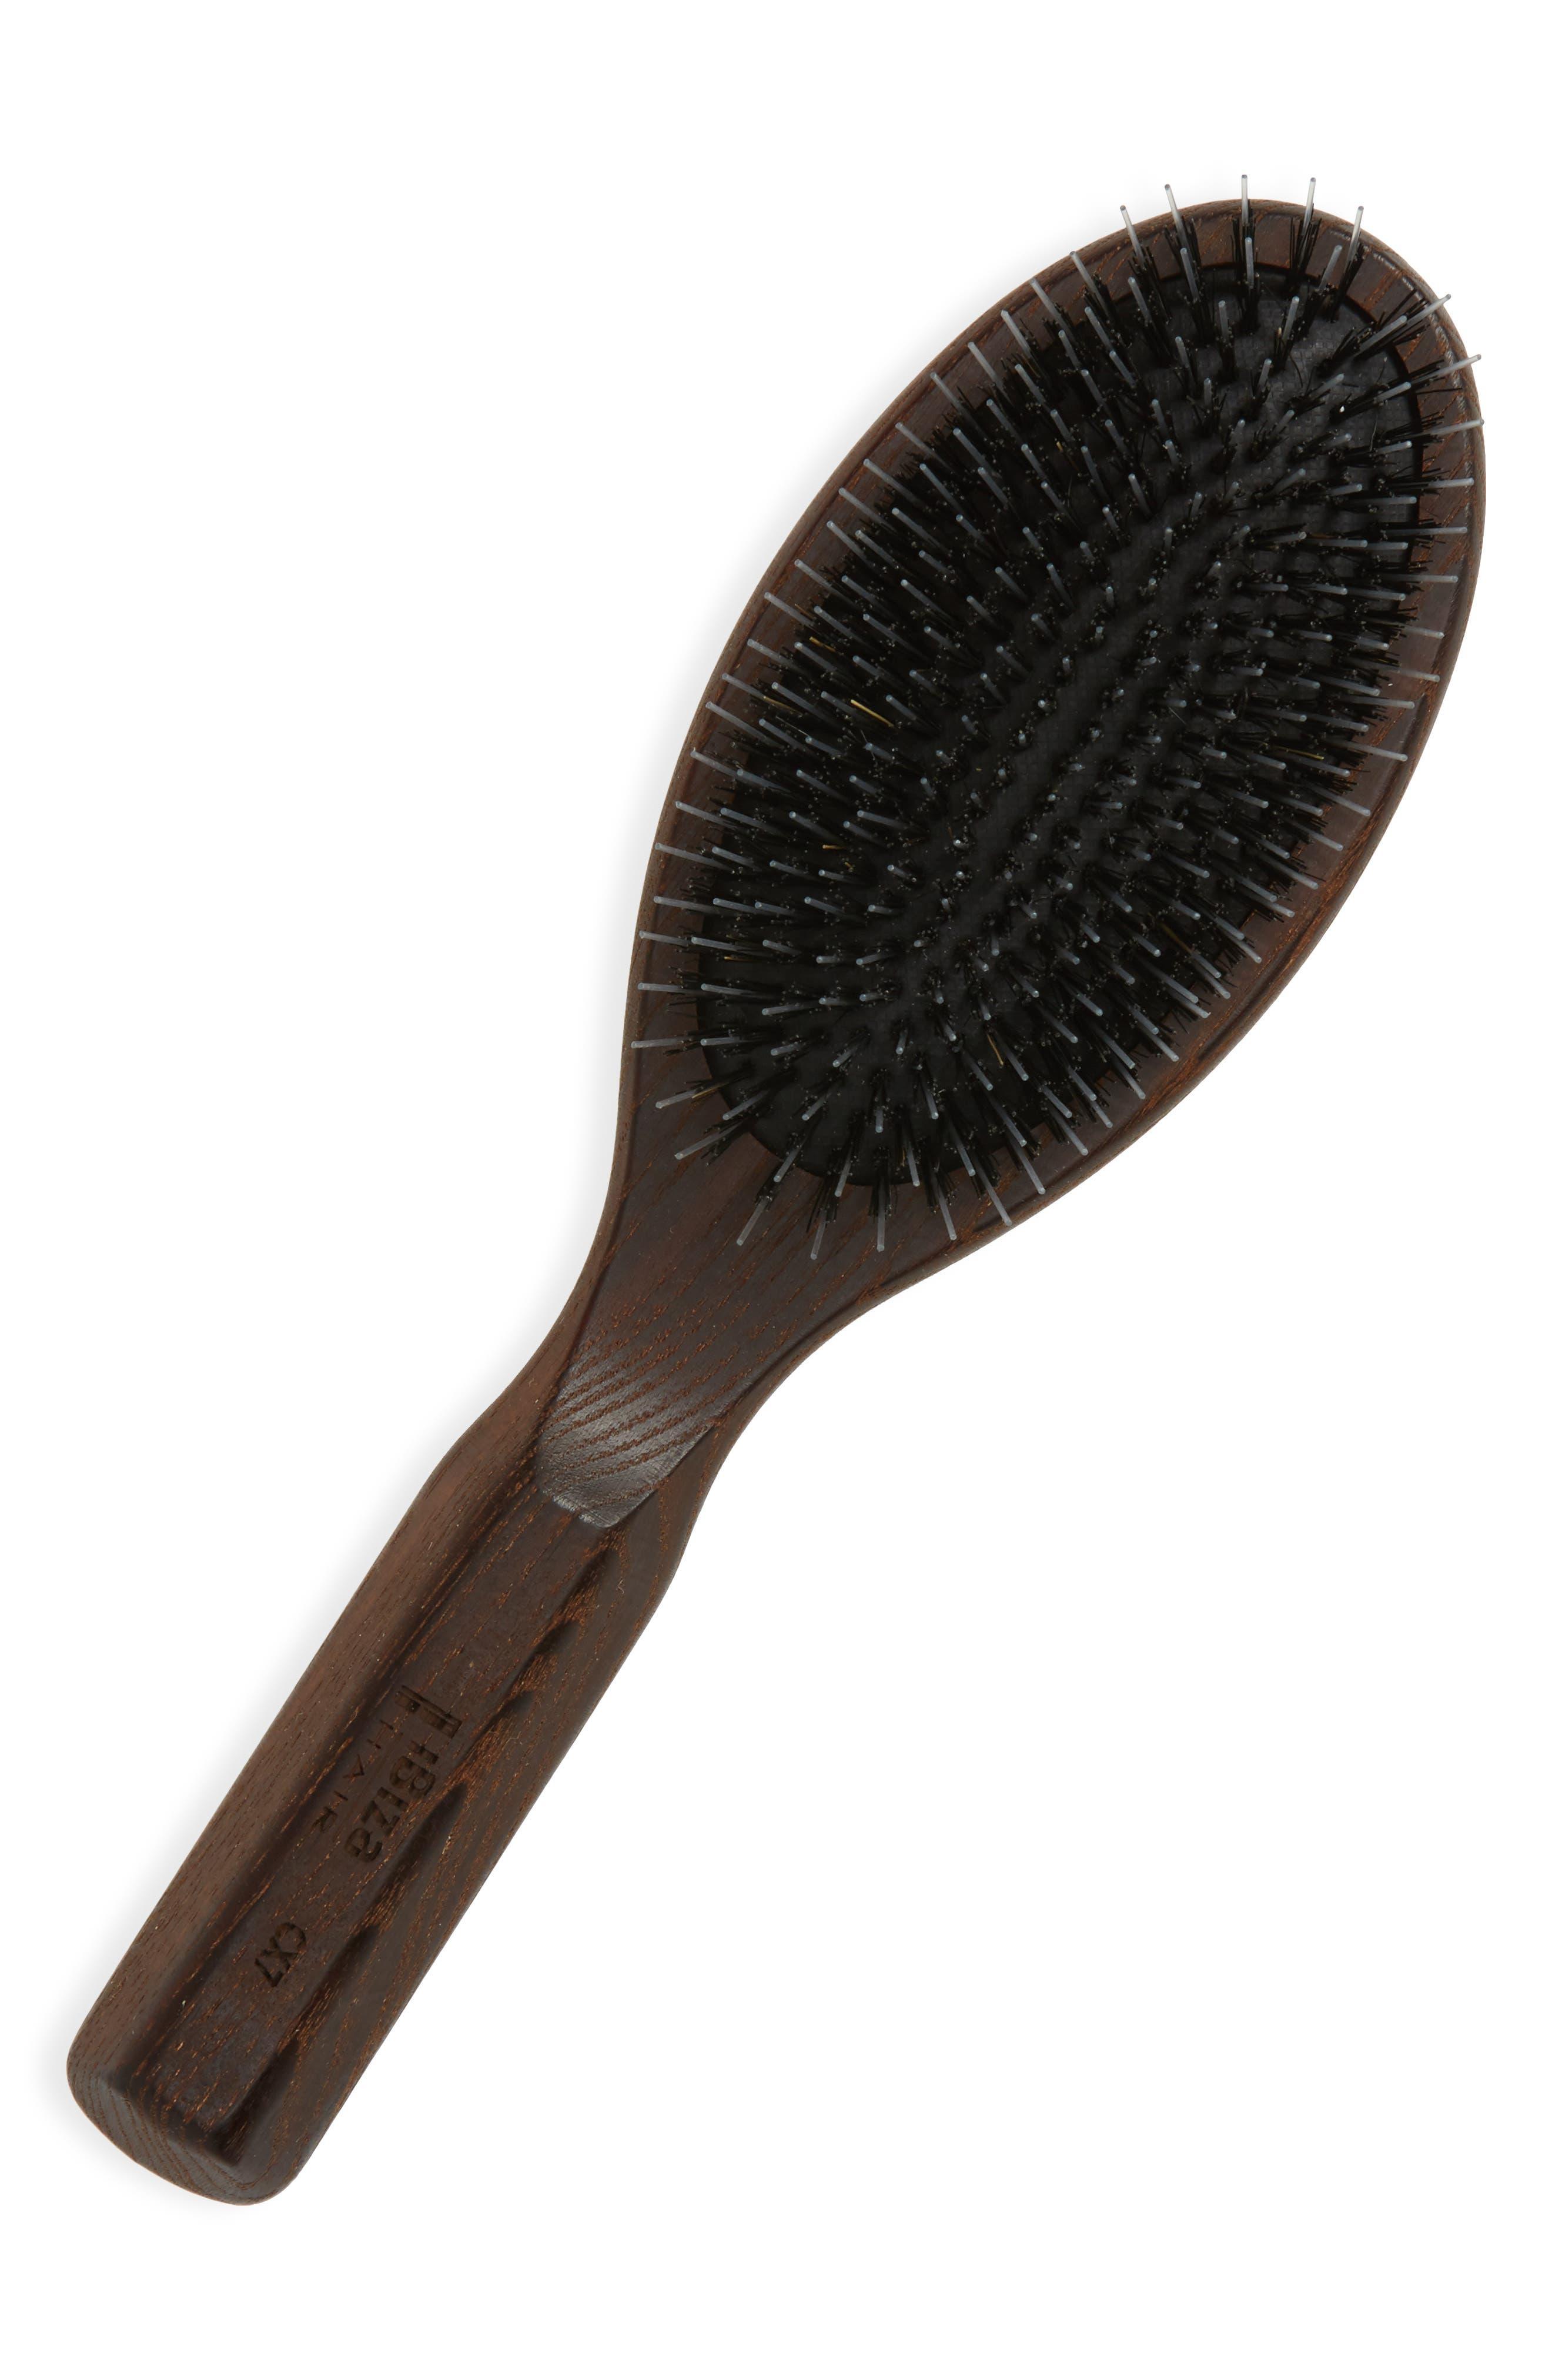 Main Image - Ibiza Hair CX7 Oval Handle Brush